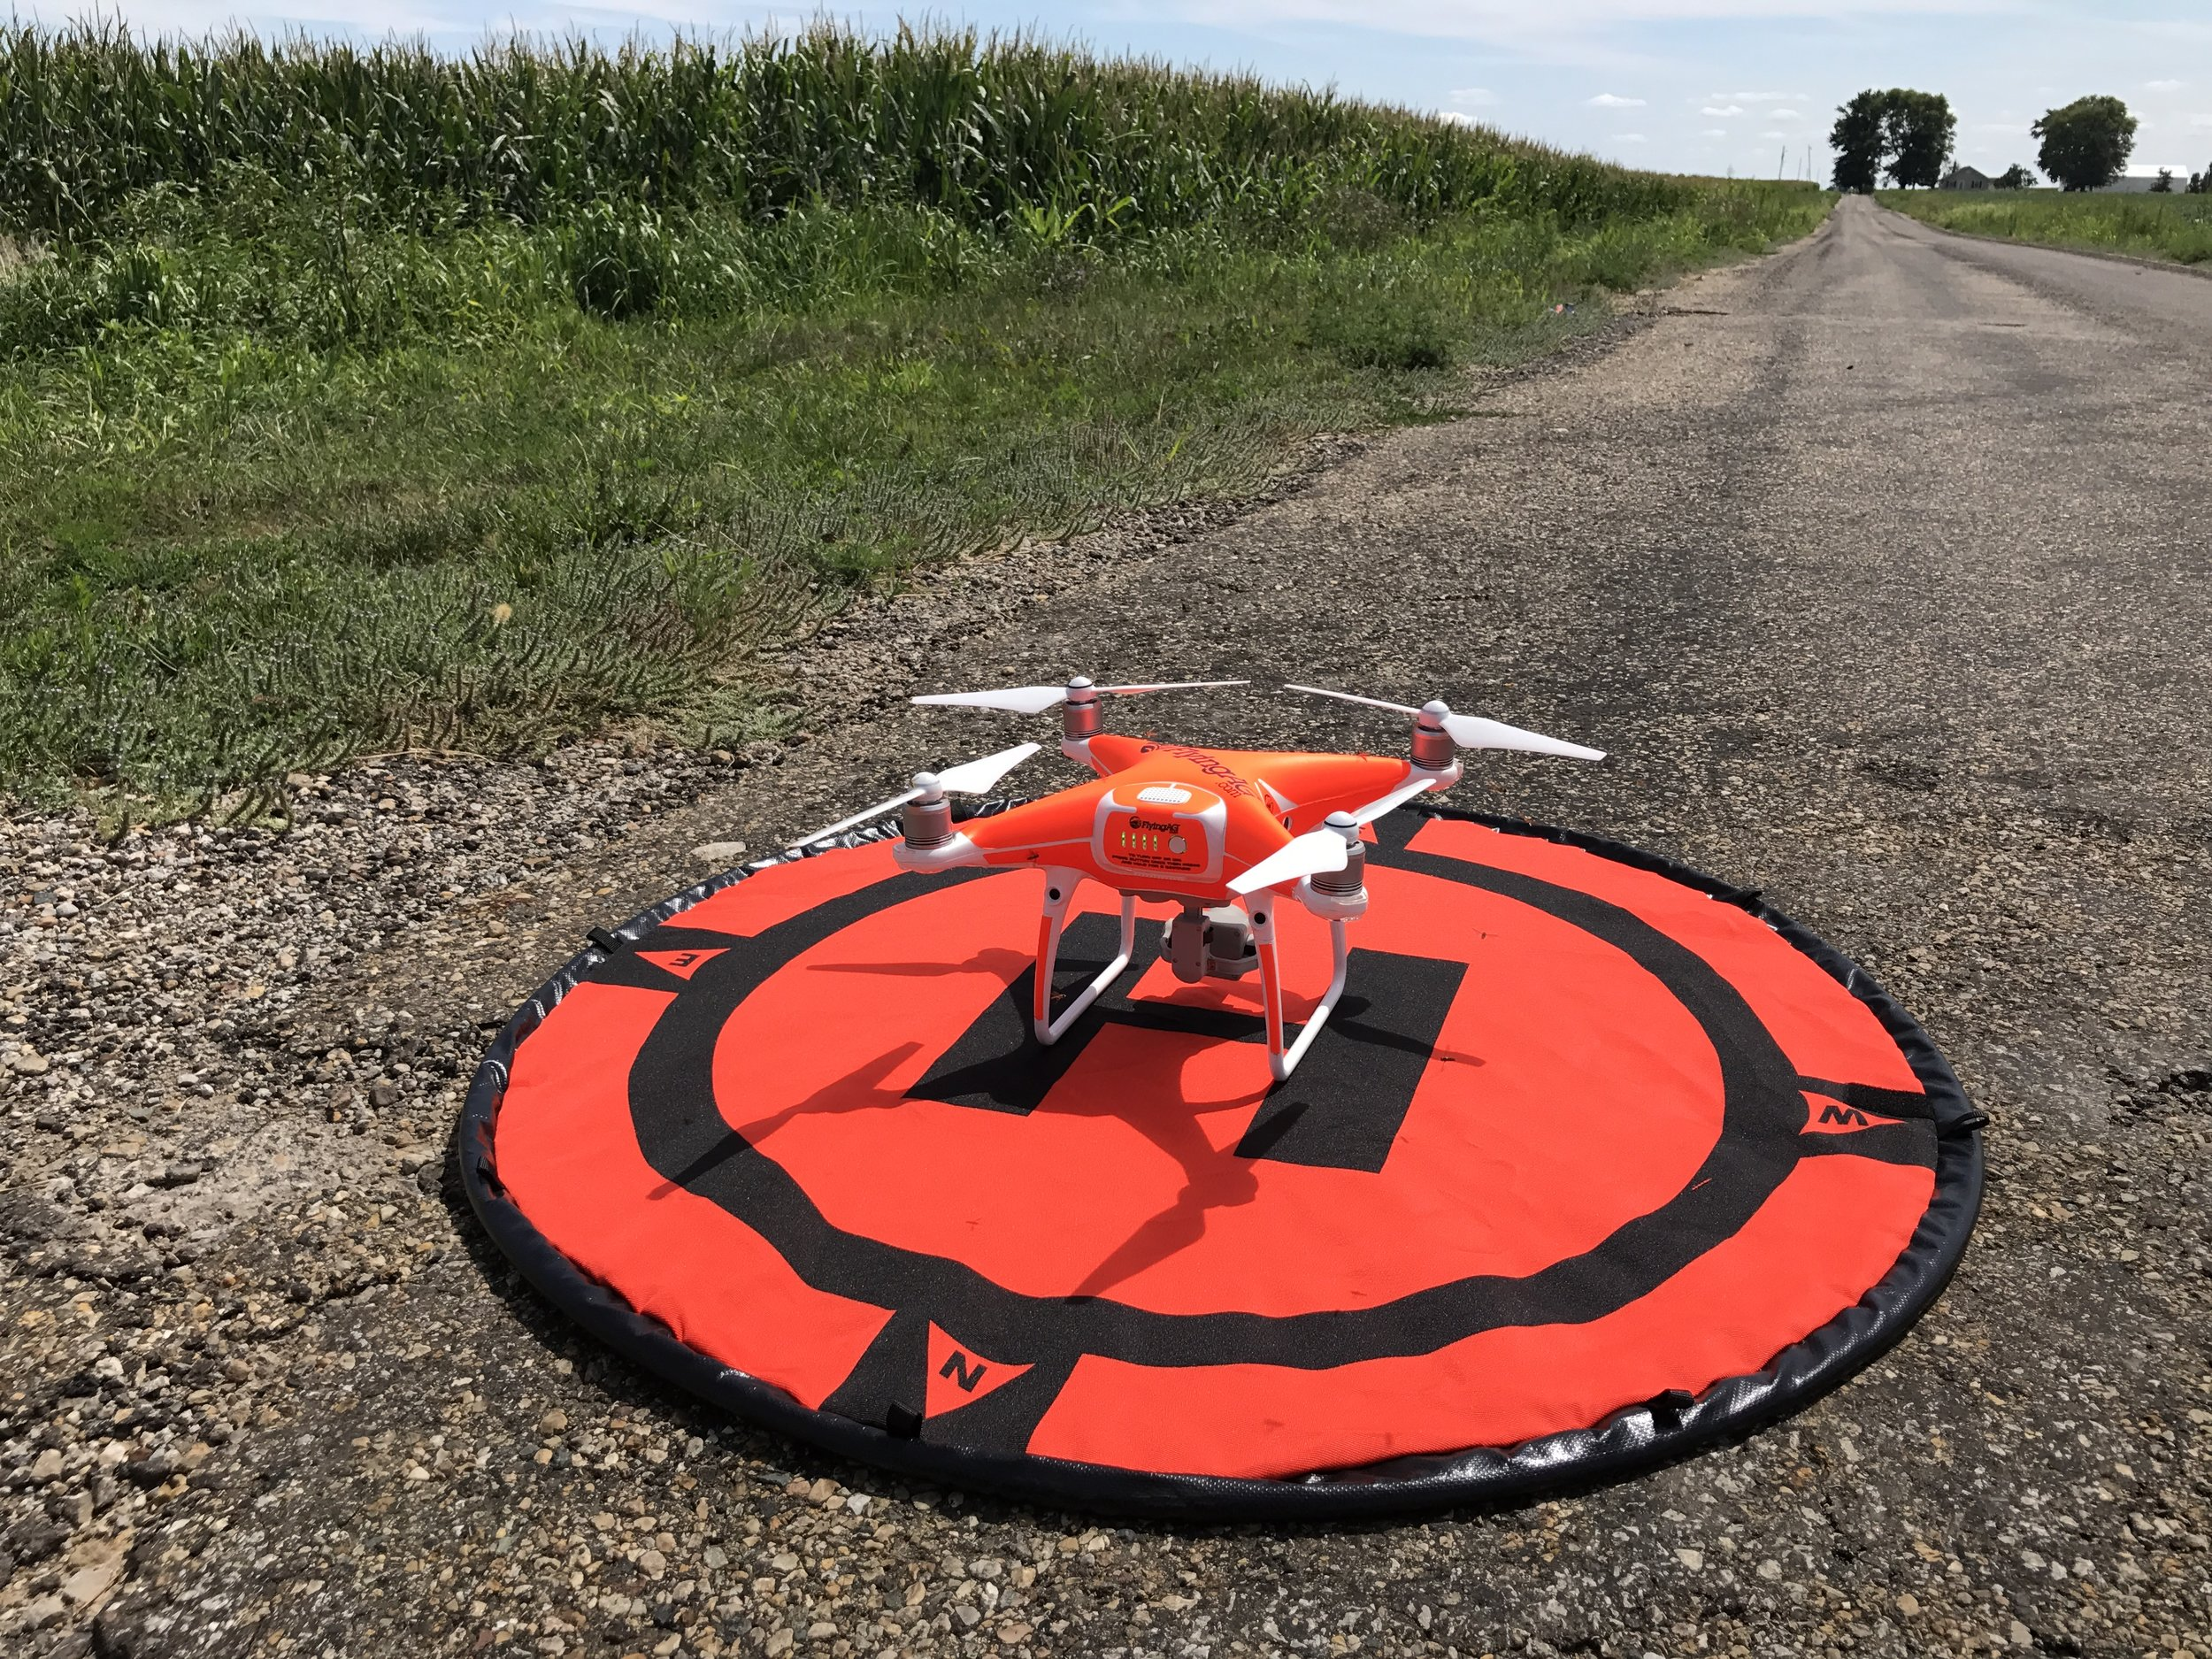 FlyingAg DJI Phantom 4 Pro Kit, Price $2000 +/-